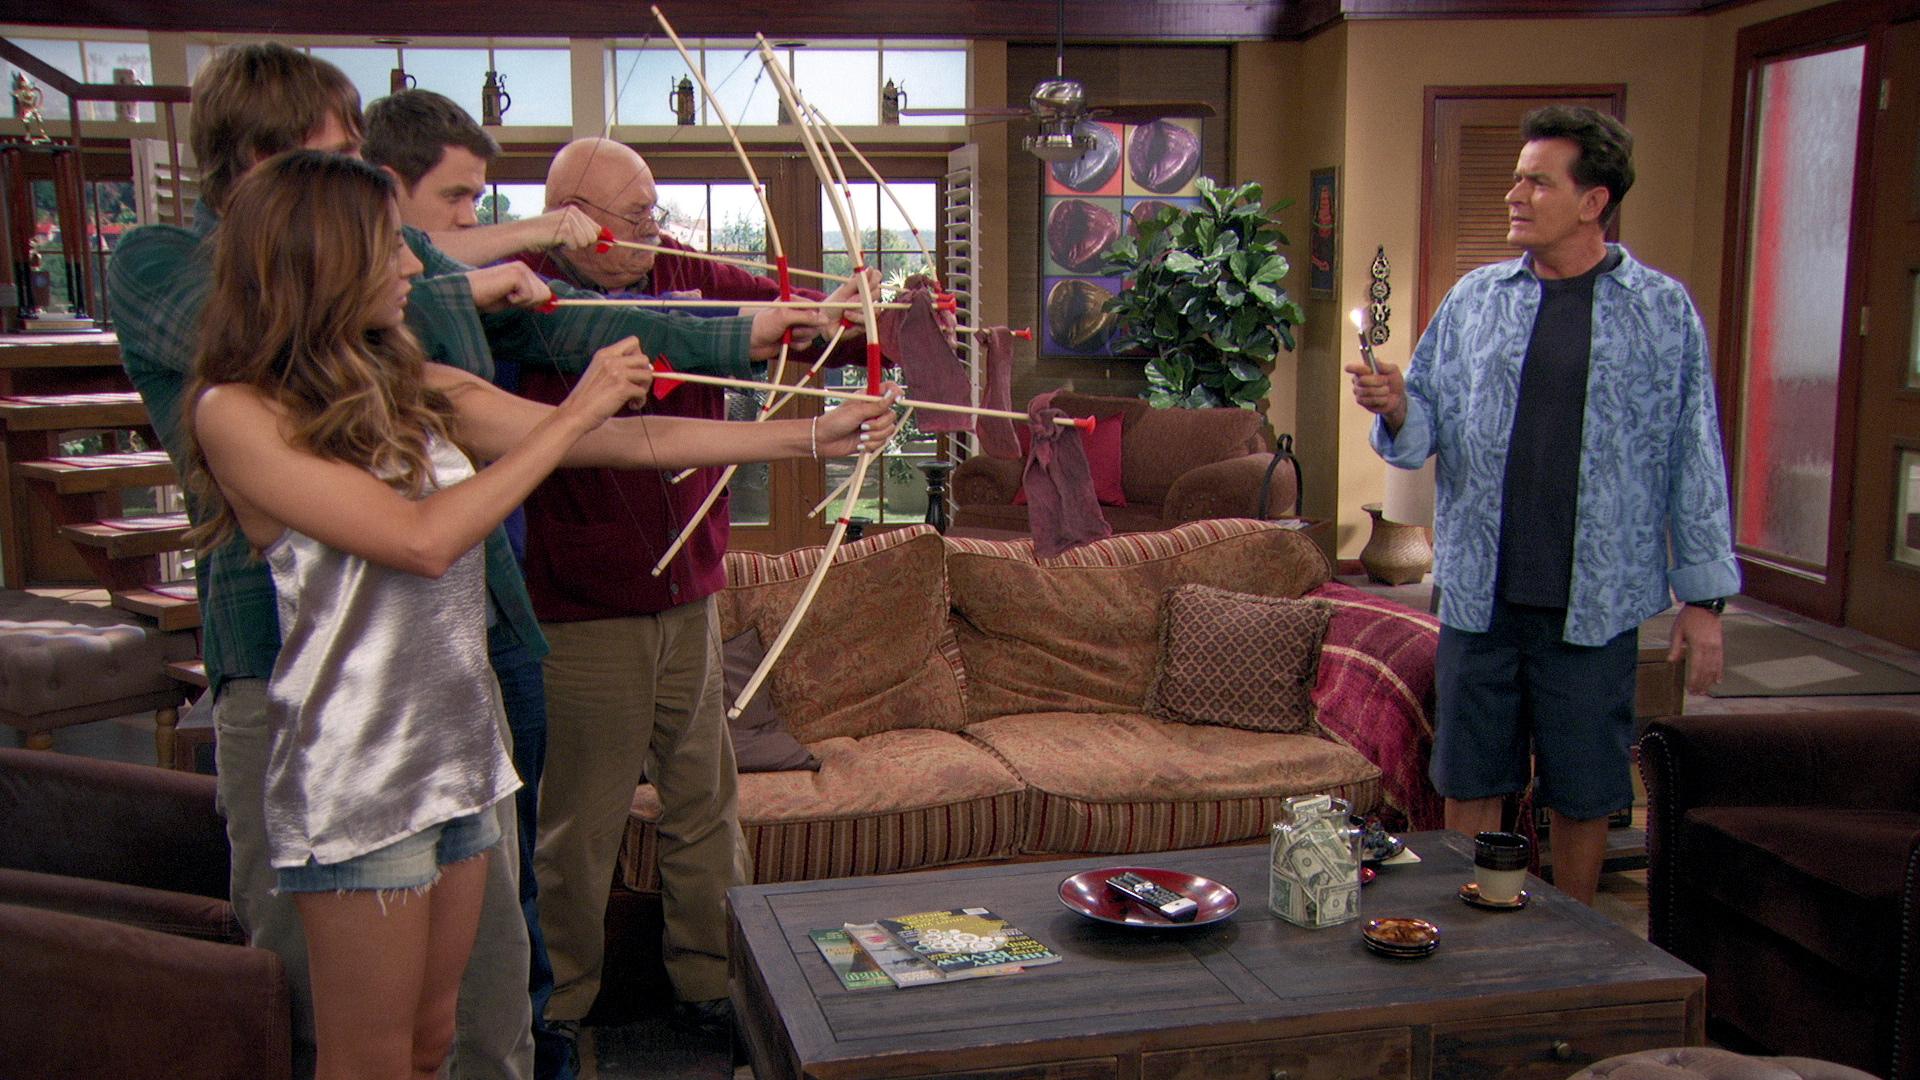 anger management 11 Episode recap anger management on tvcom watch anger management episodes, get episode information, recaps and more.